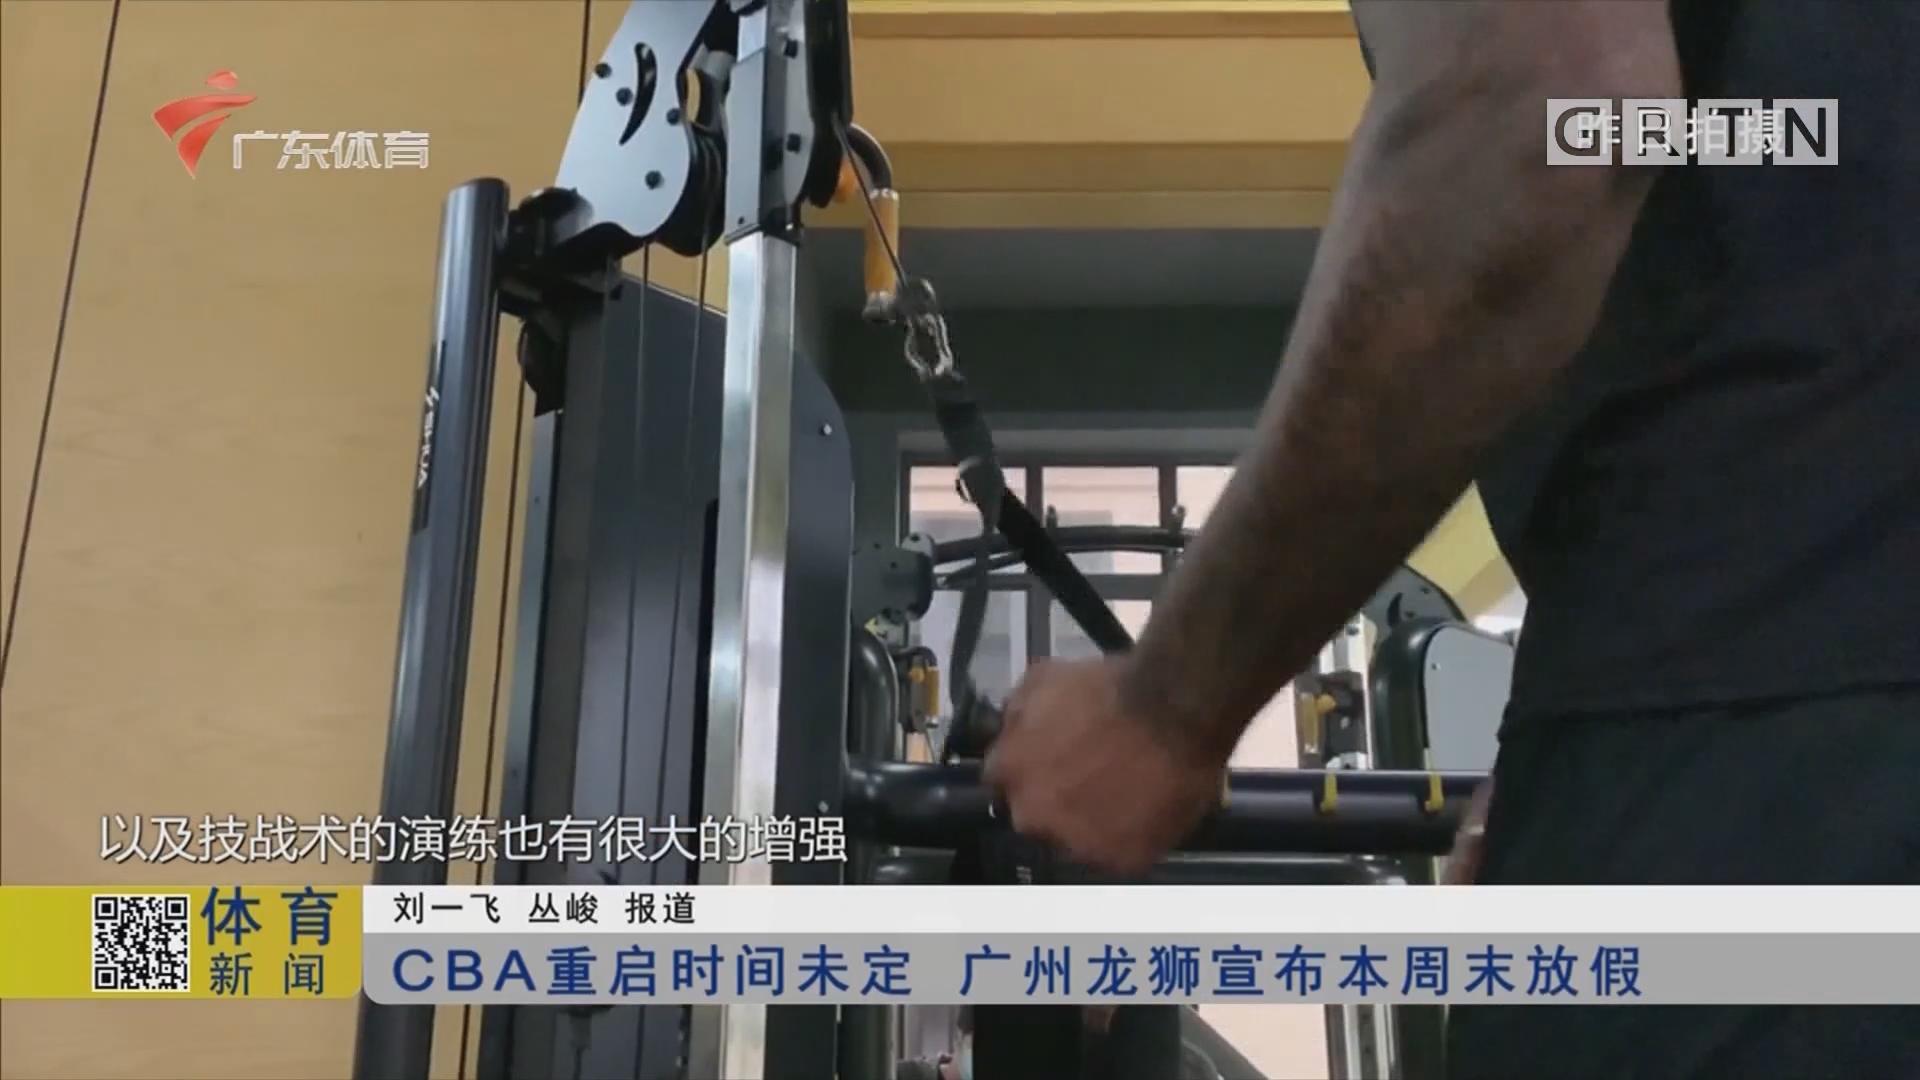 CBA重啟時間未定 廣州龍獅宣布本周末放假